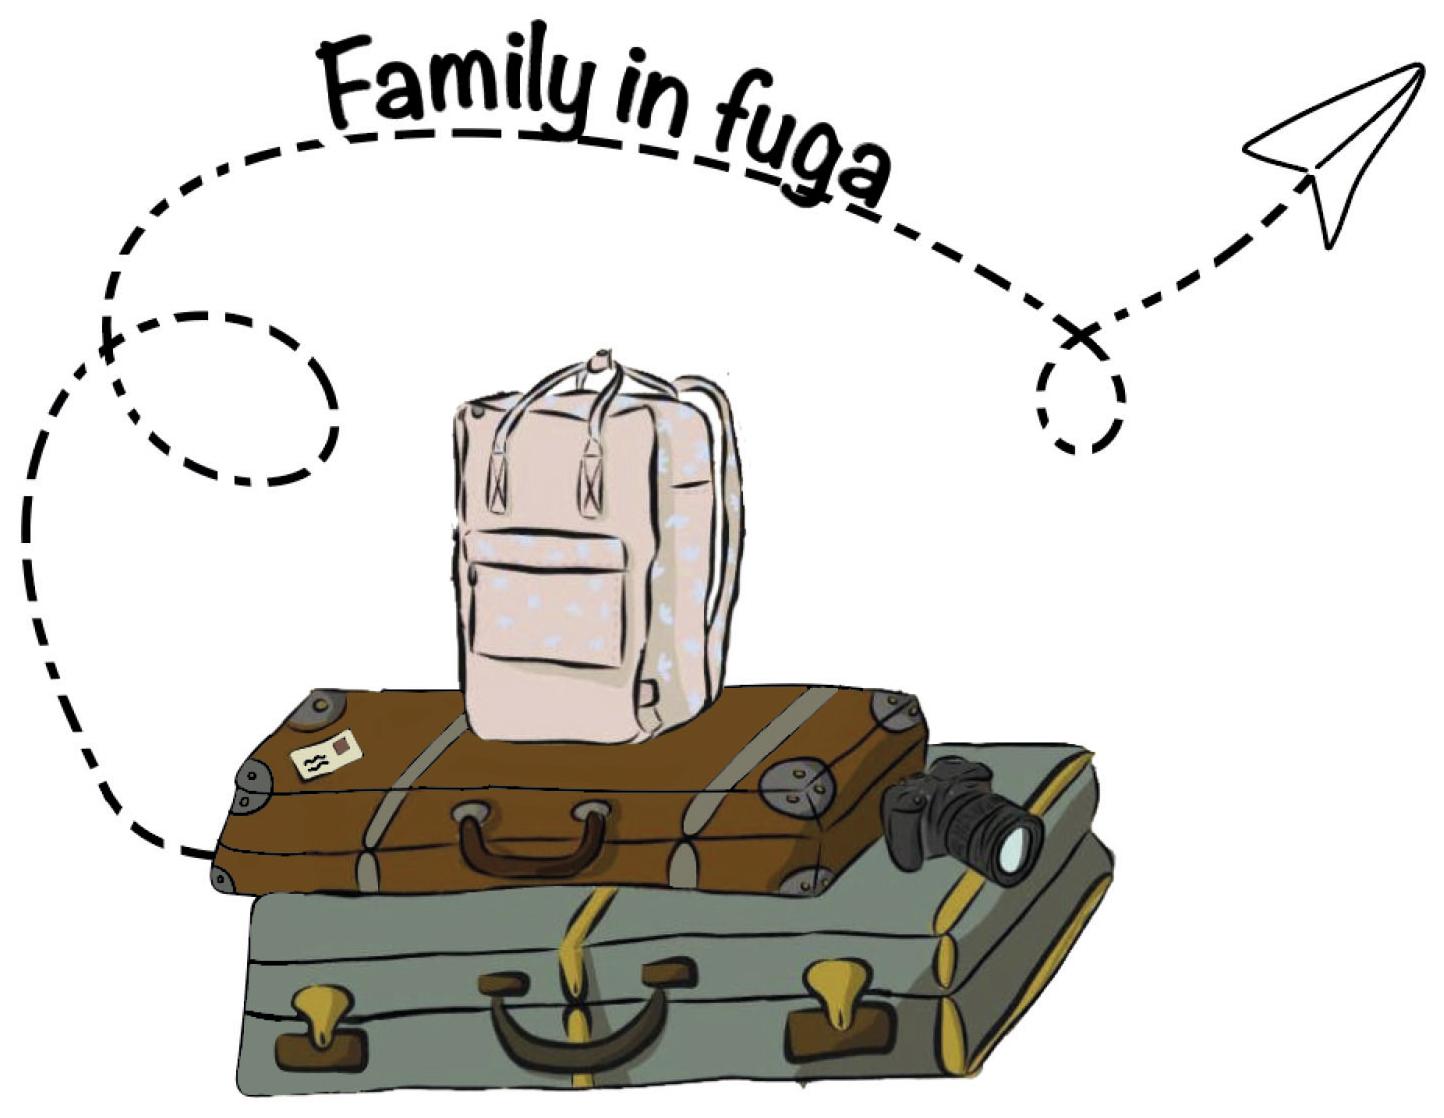 FamilyinFuga